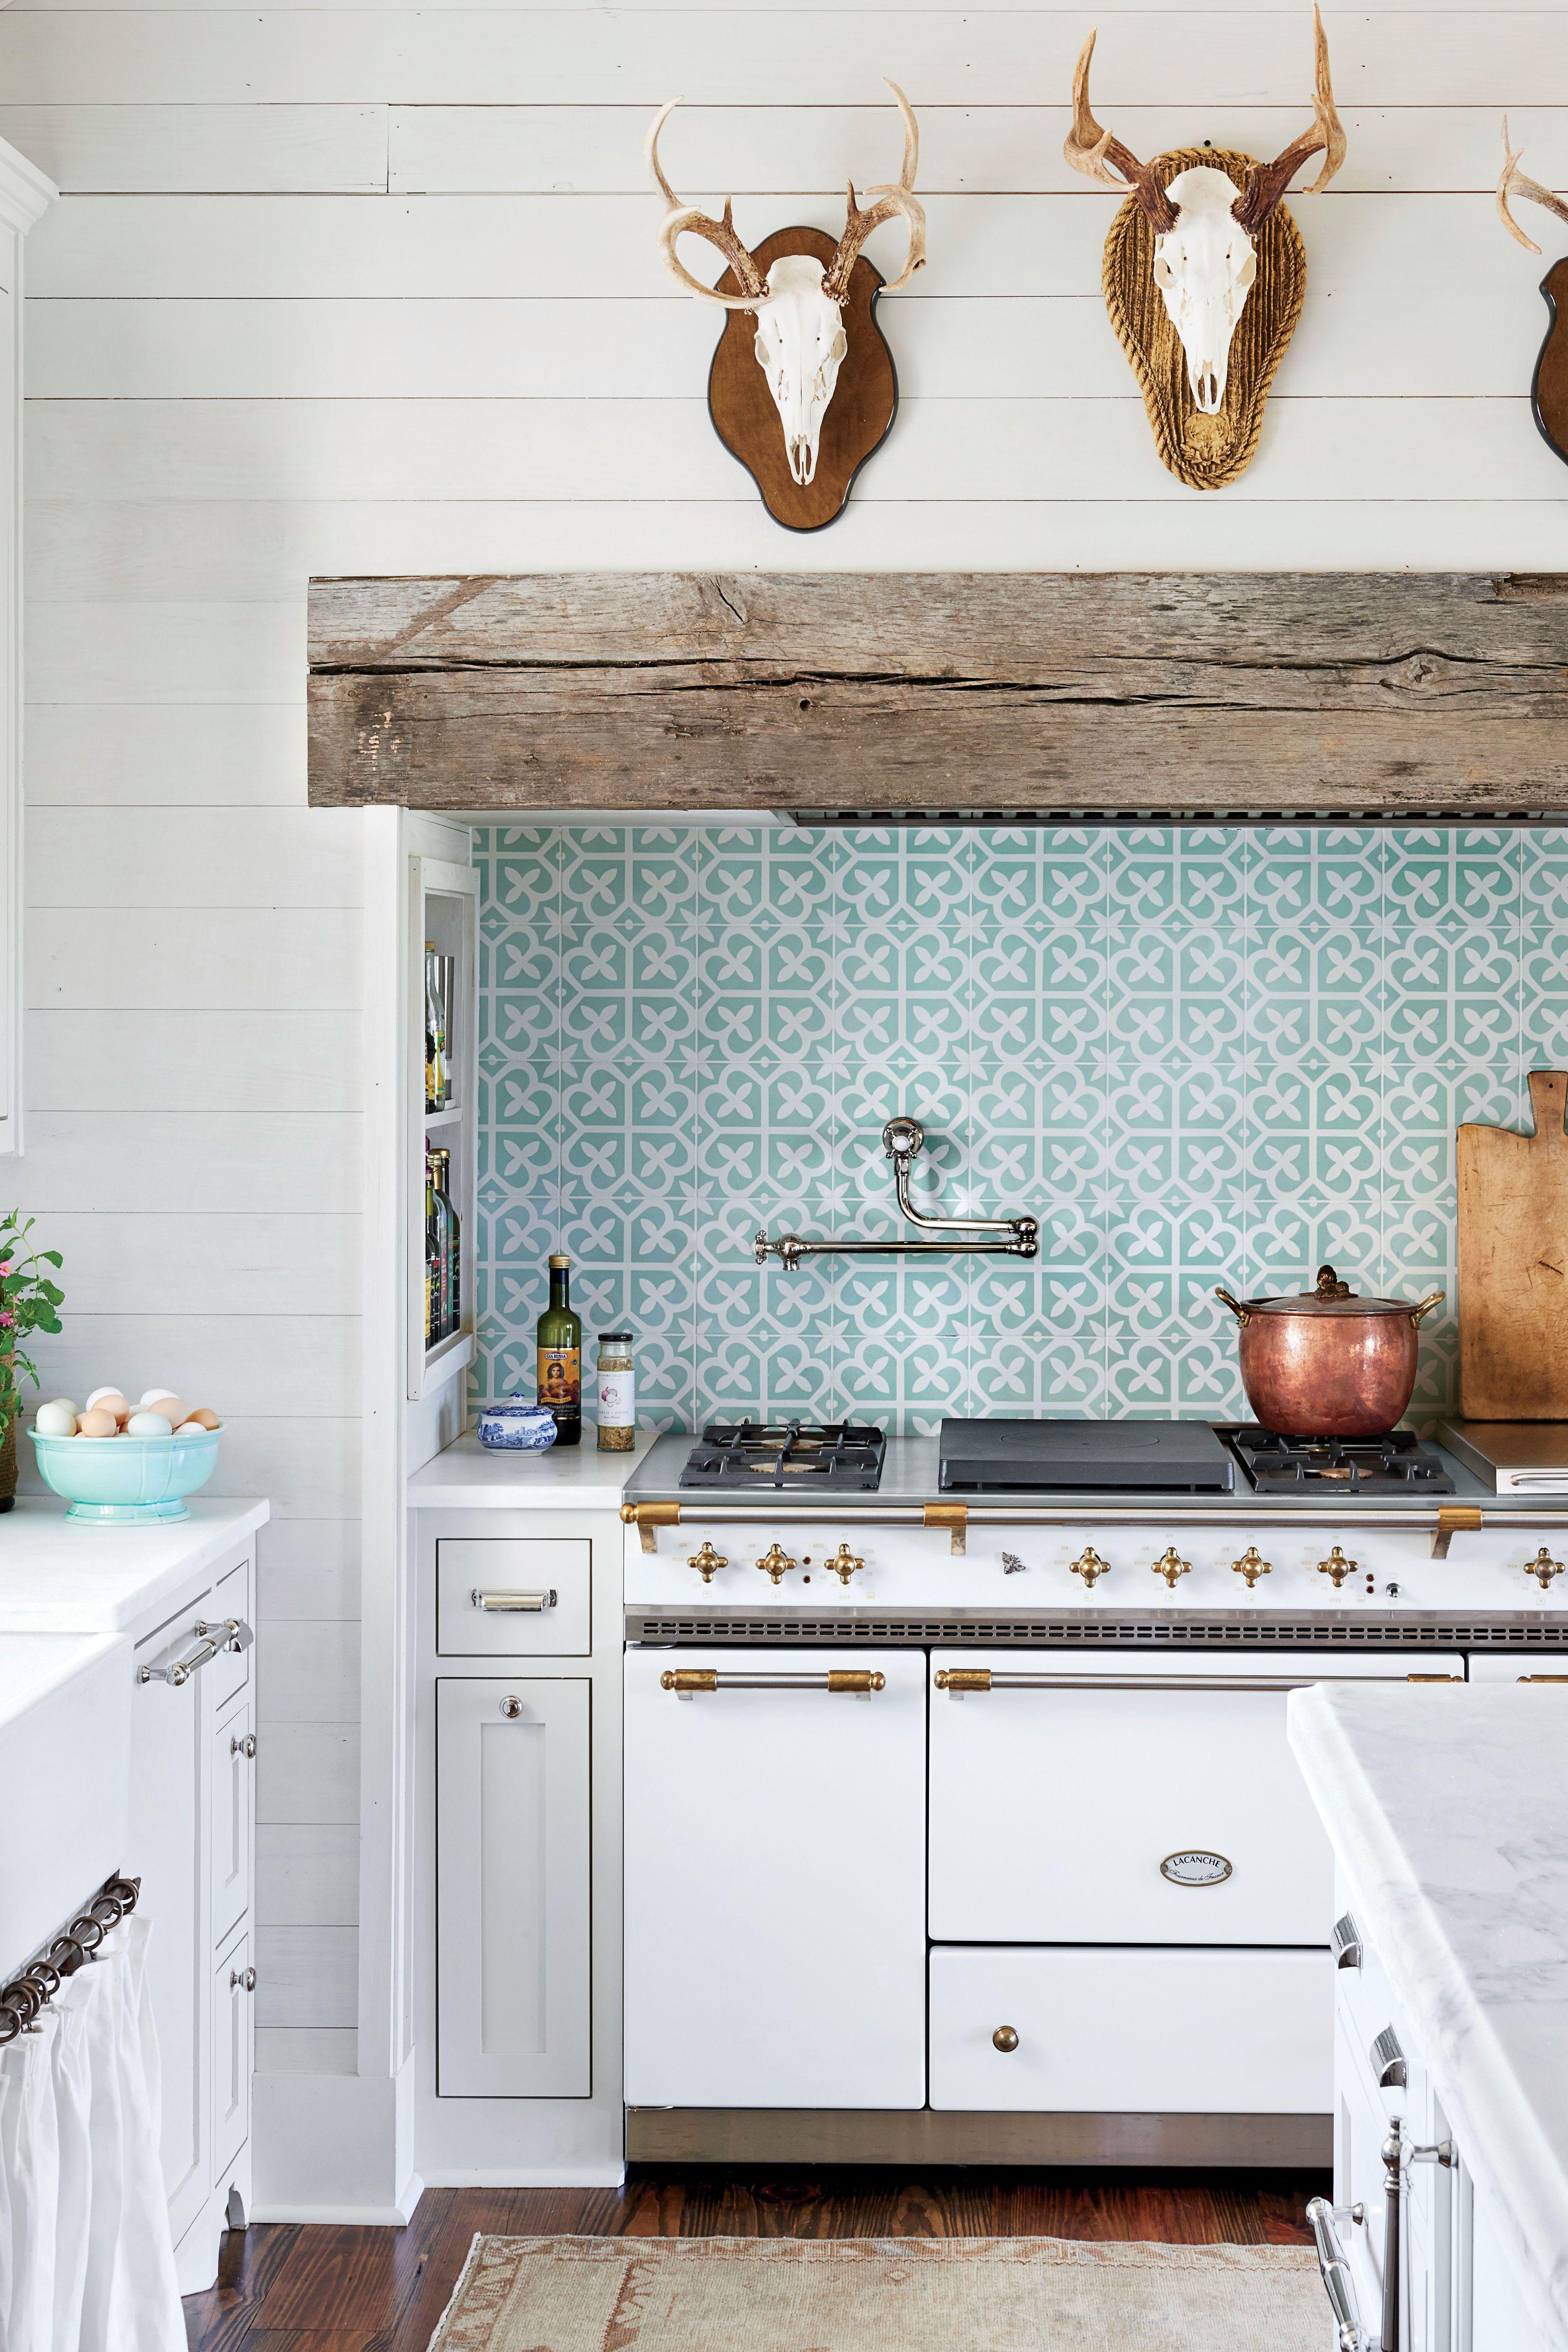 Colbert Farmhouse in Dothan, AL | Kitchens | Pinterest | White ...